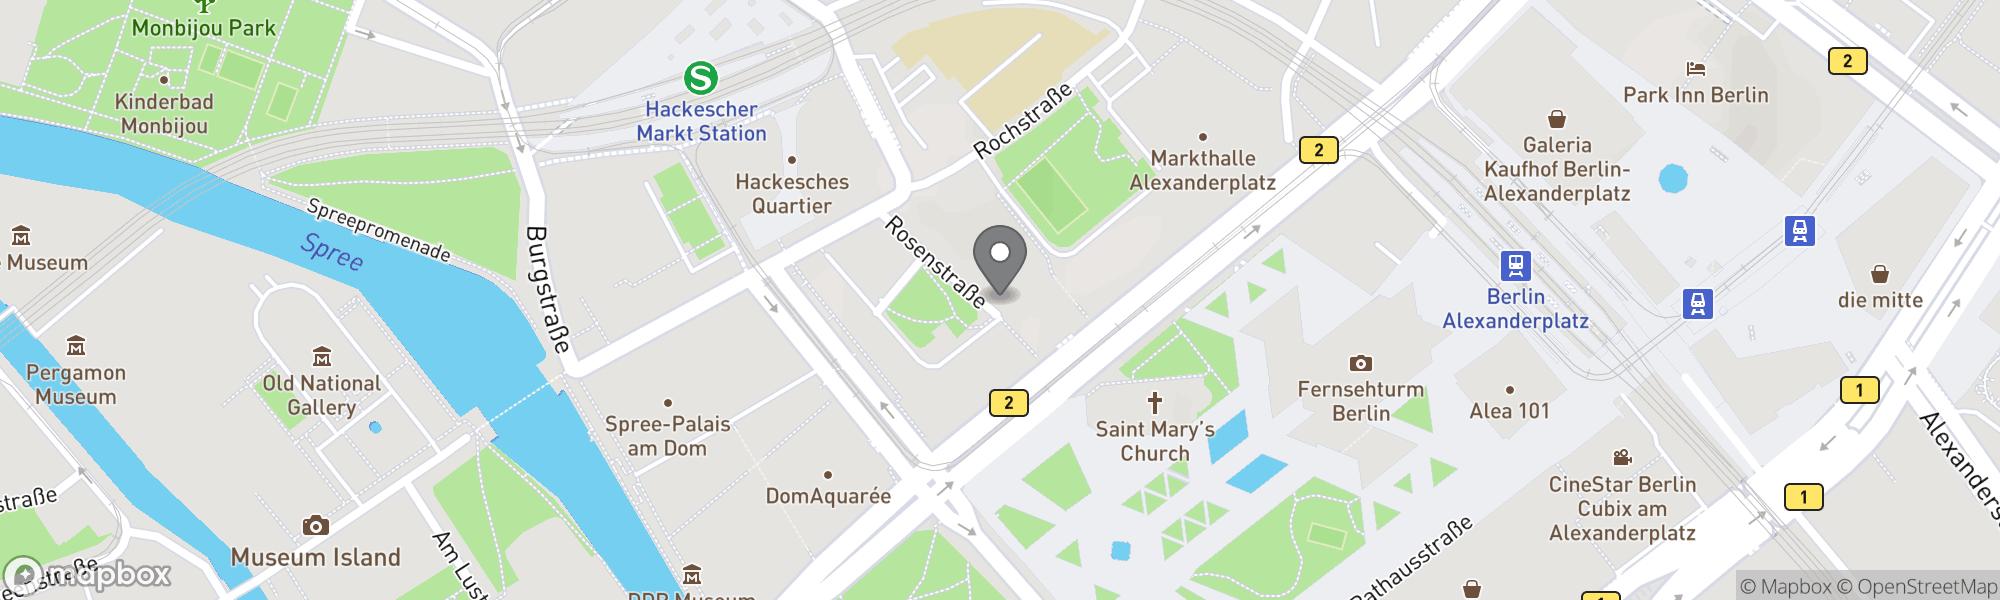 Map of Berlin area